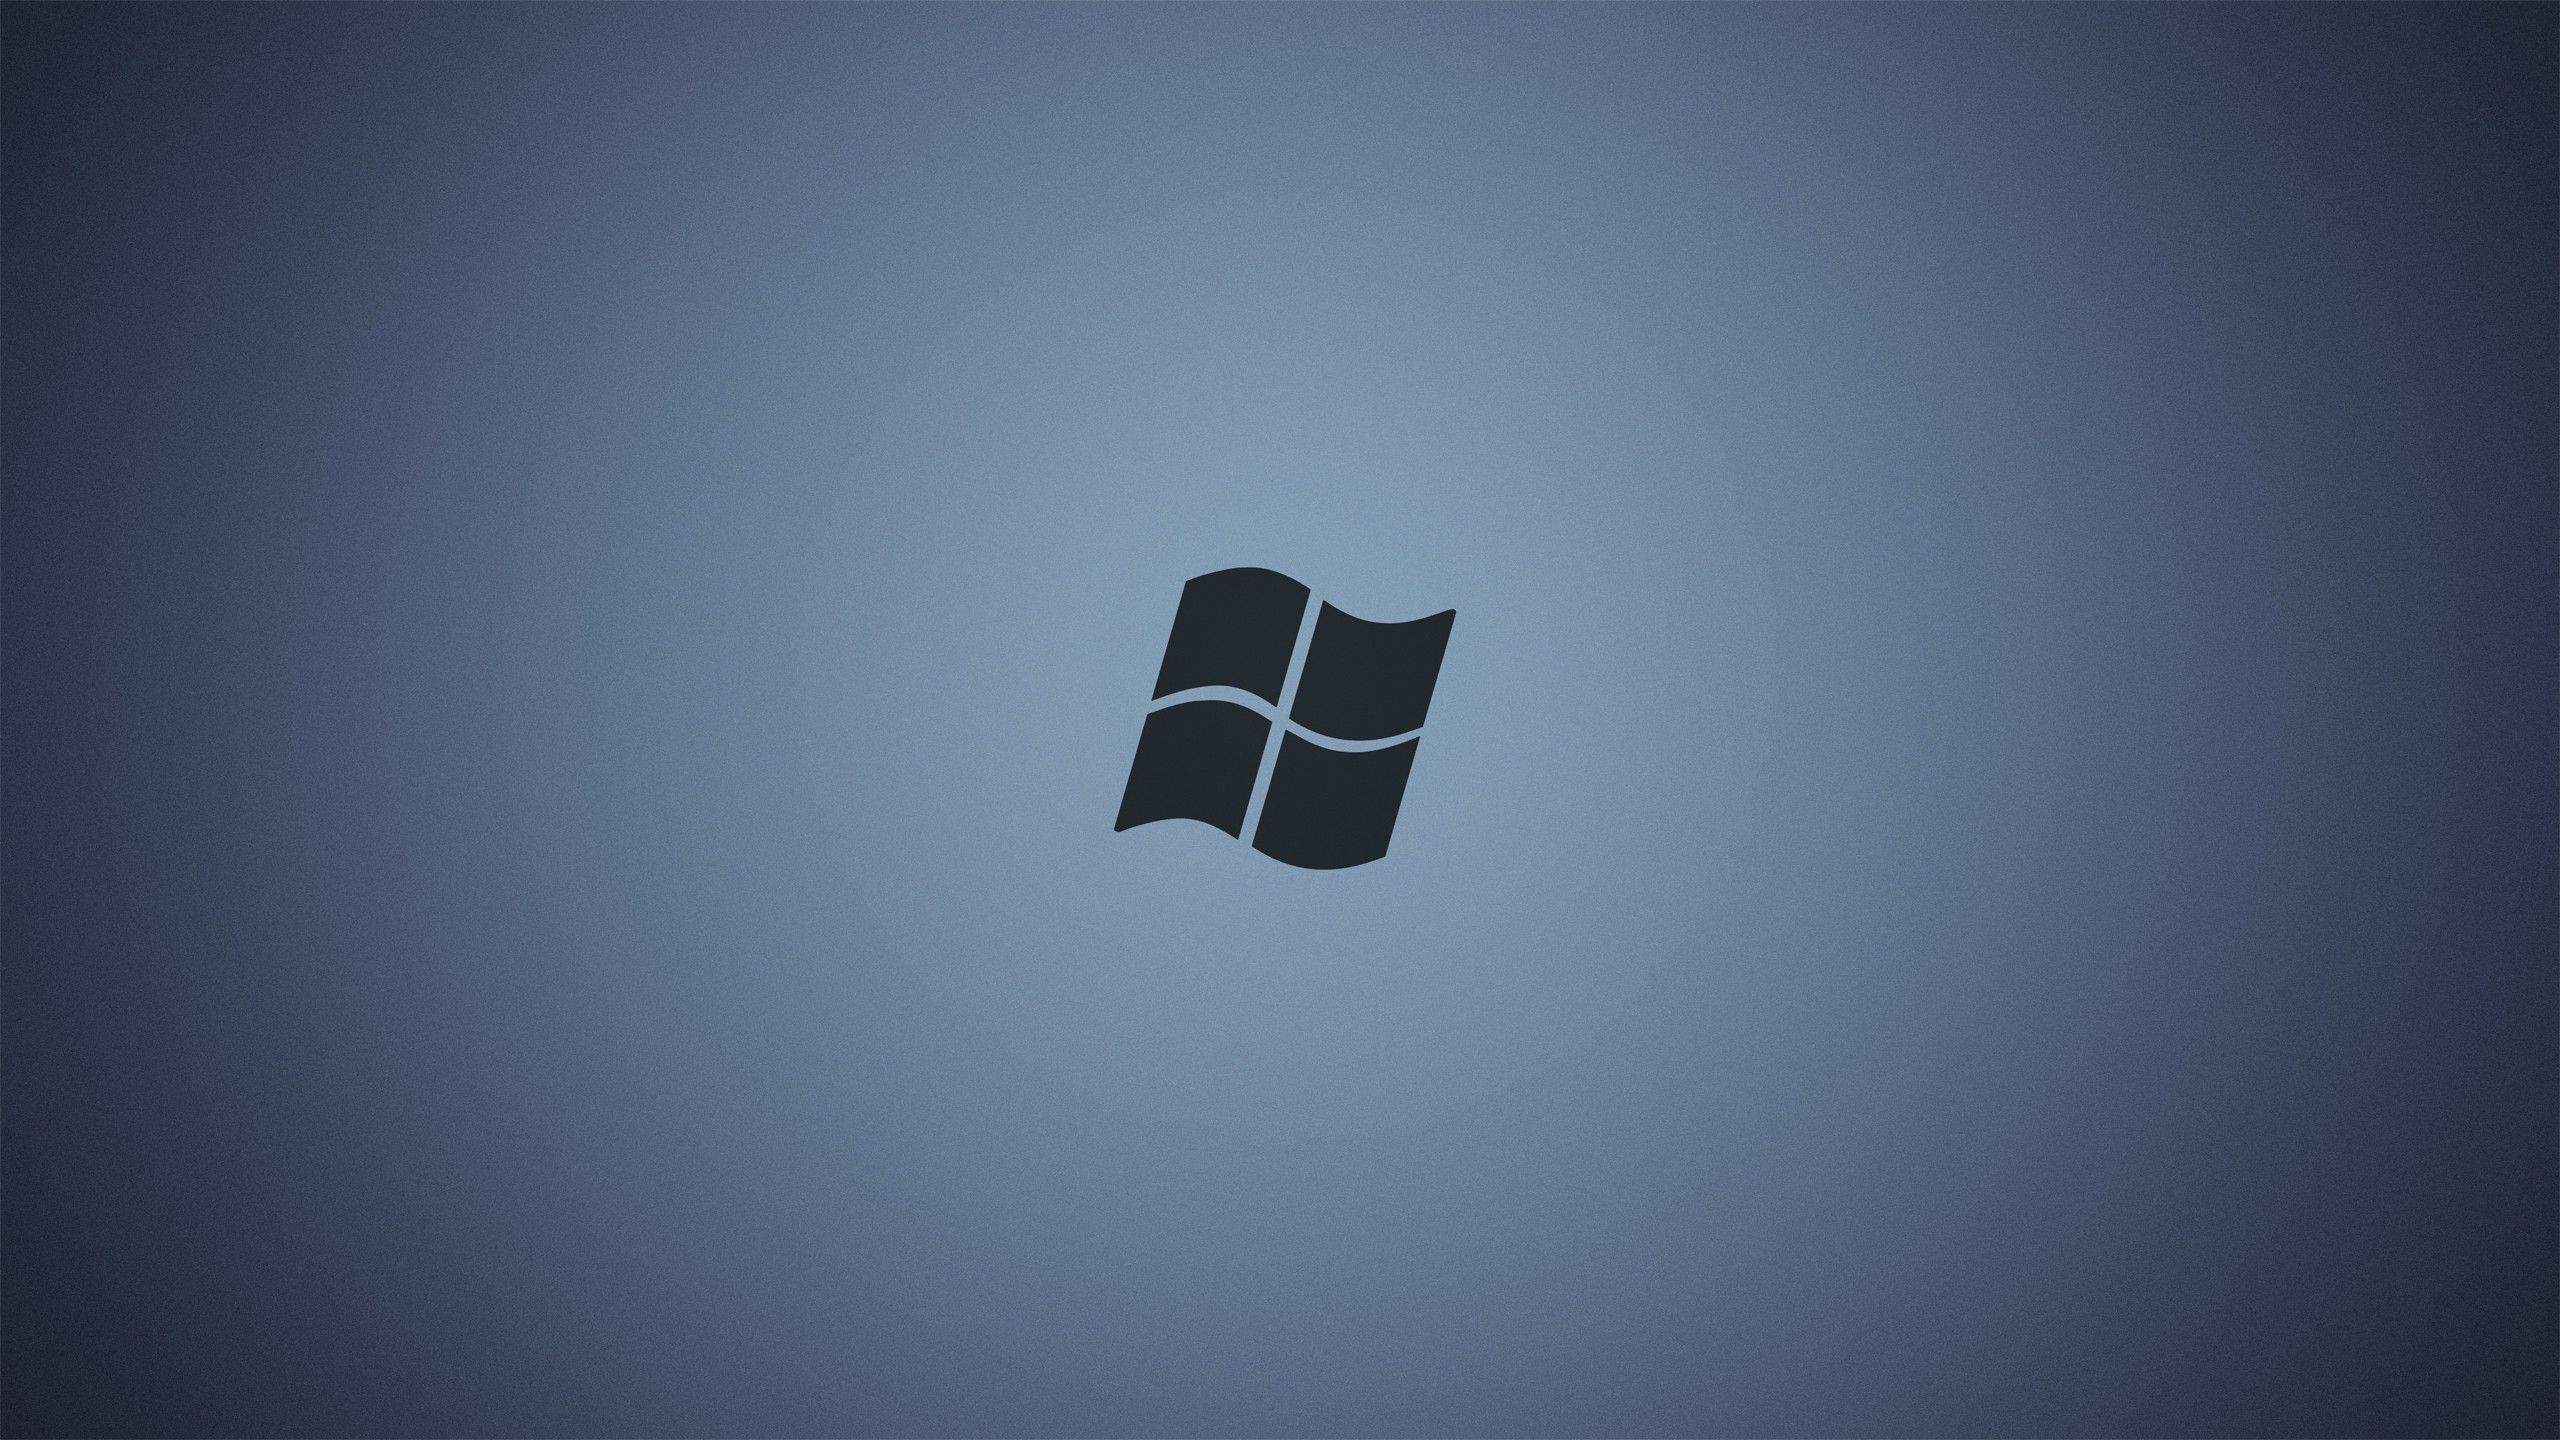 Minimalist Windows Wallpapers Top Free Minimalist Windows